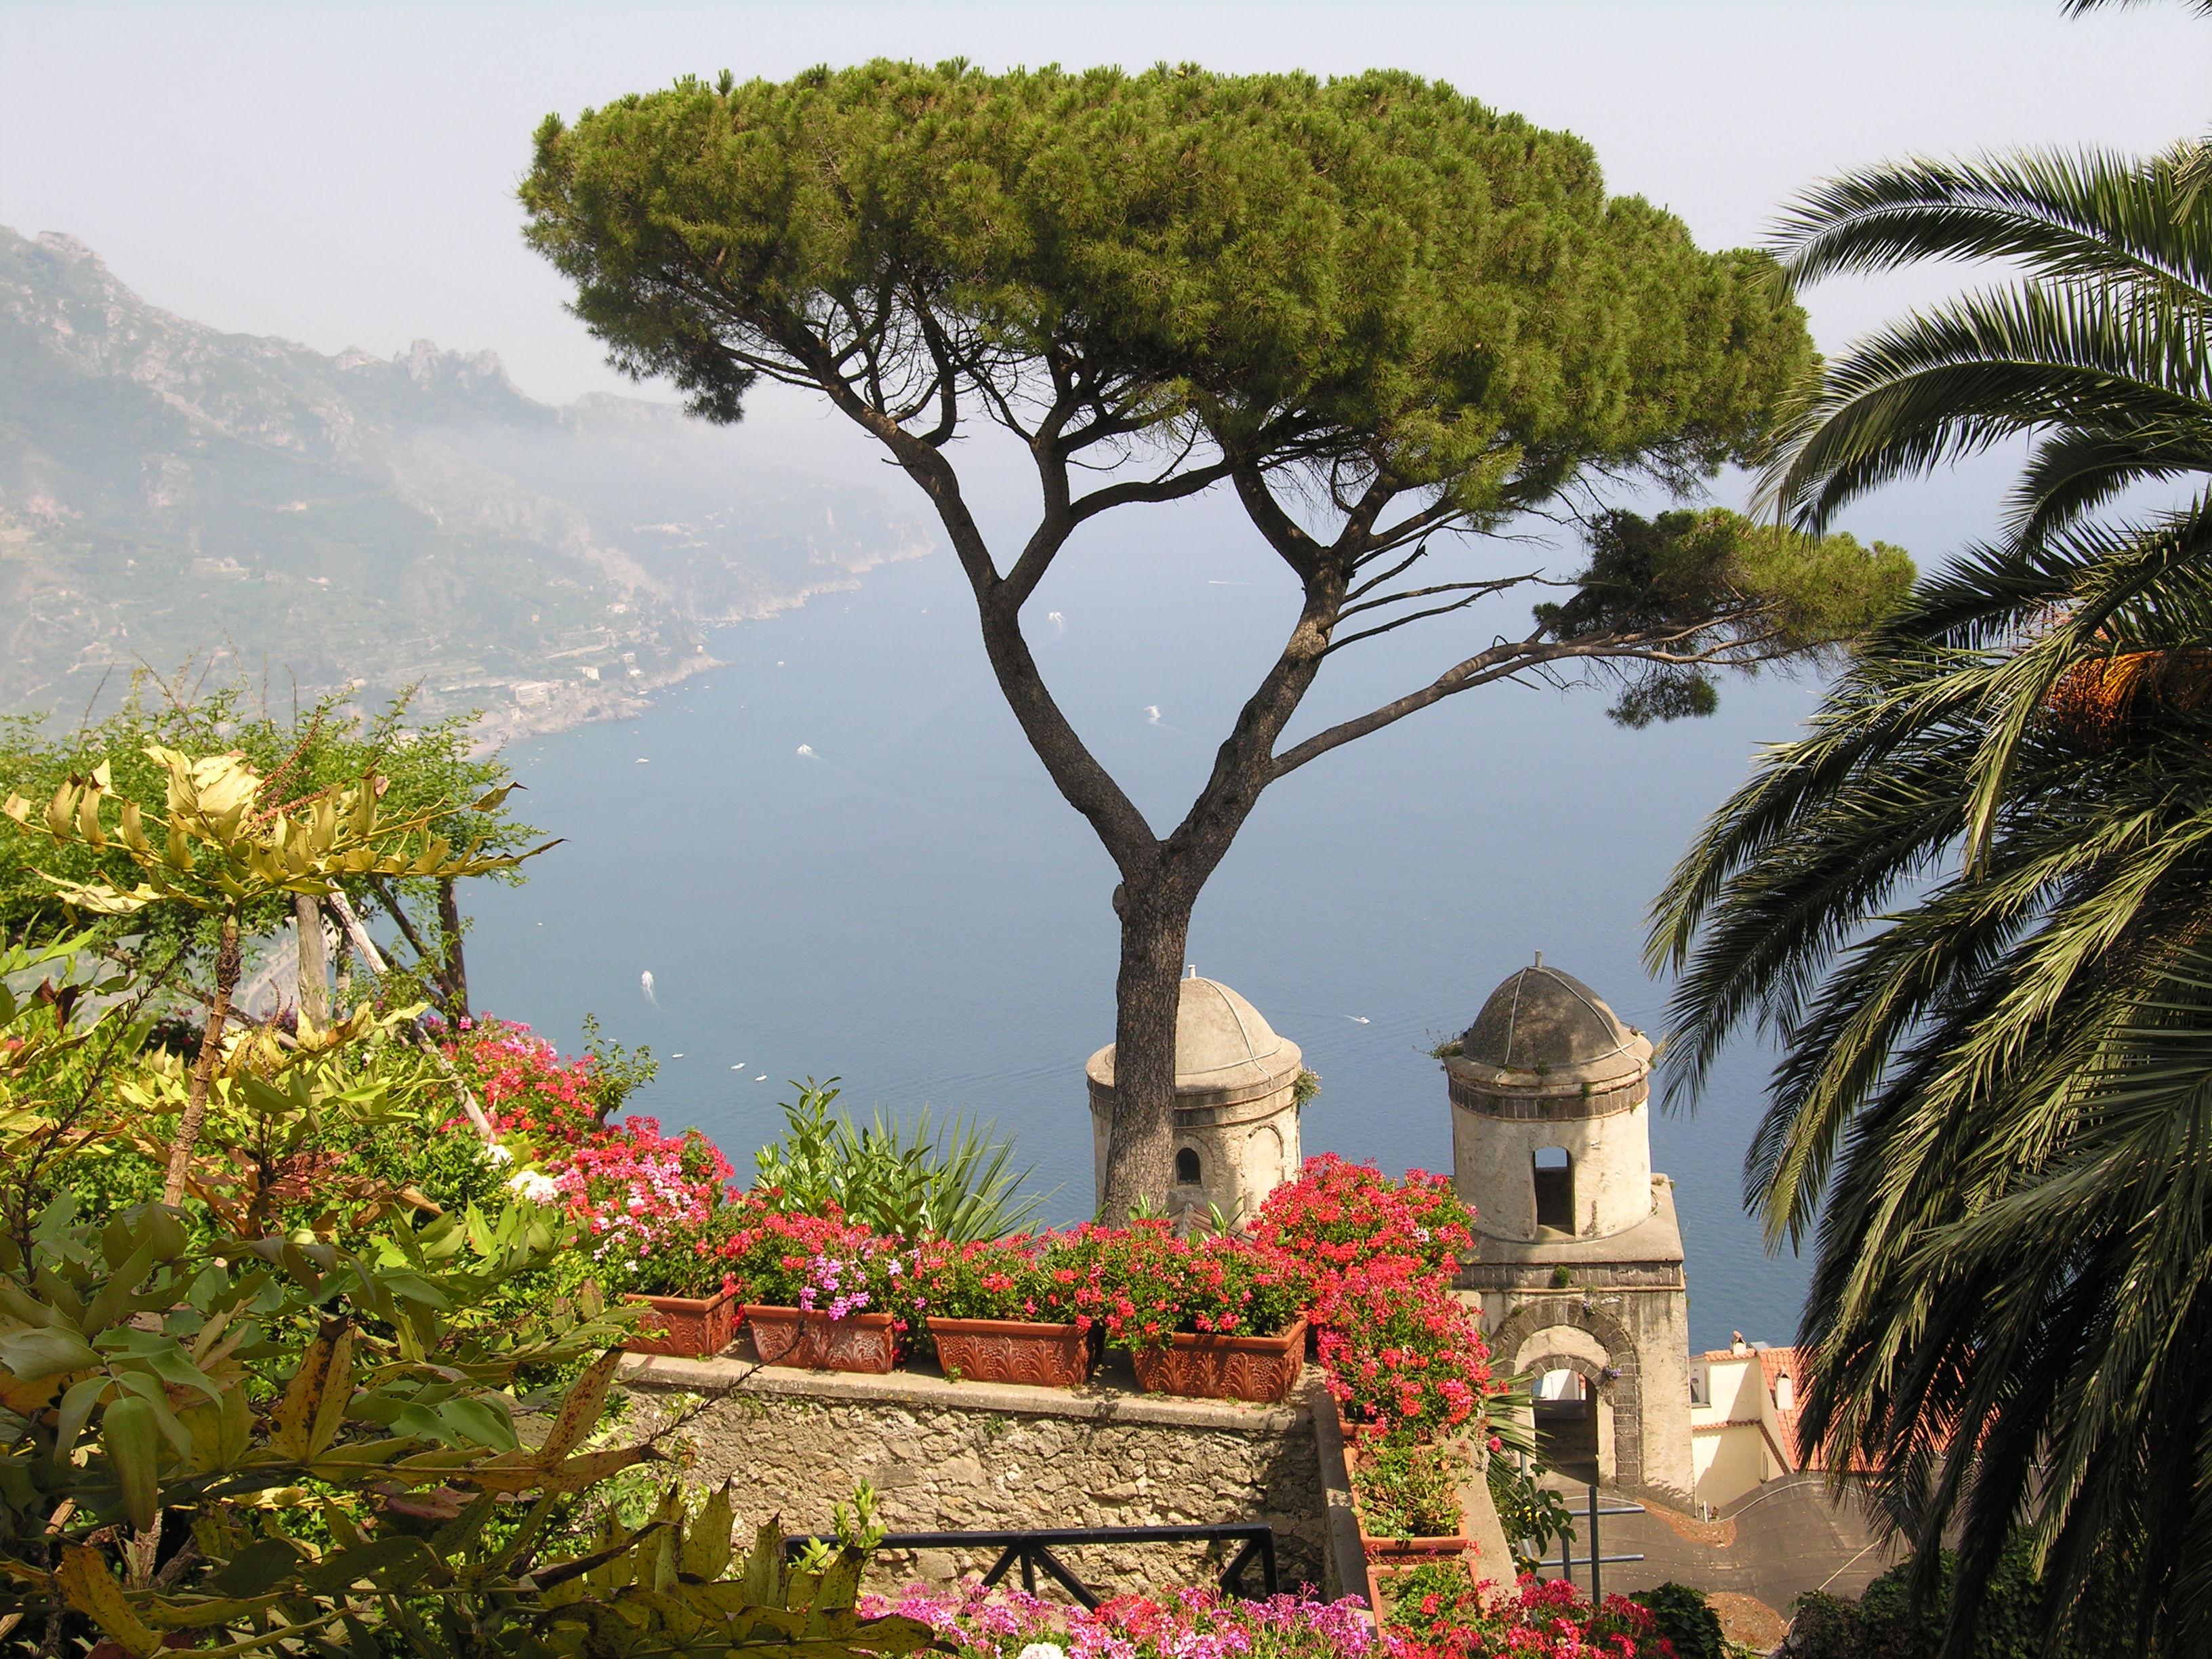 26fce79795d3f ساحل أمالفي من جانب رافيلو، وهو أحد أشهر الوجهات السياحية في إيطاليا.